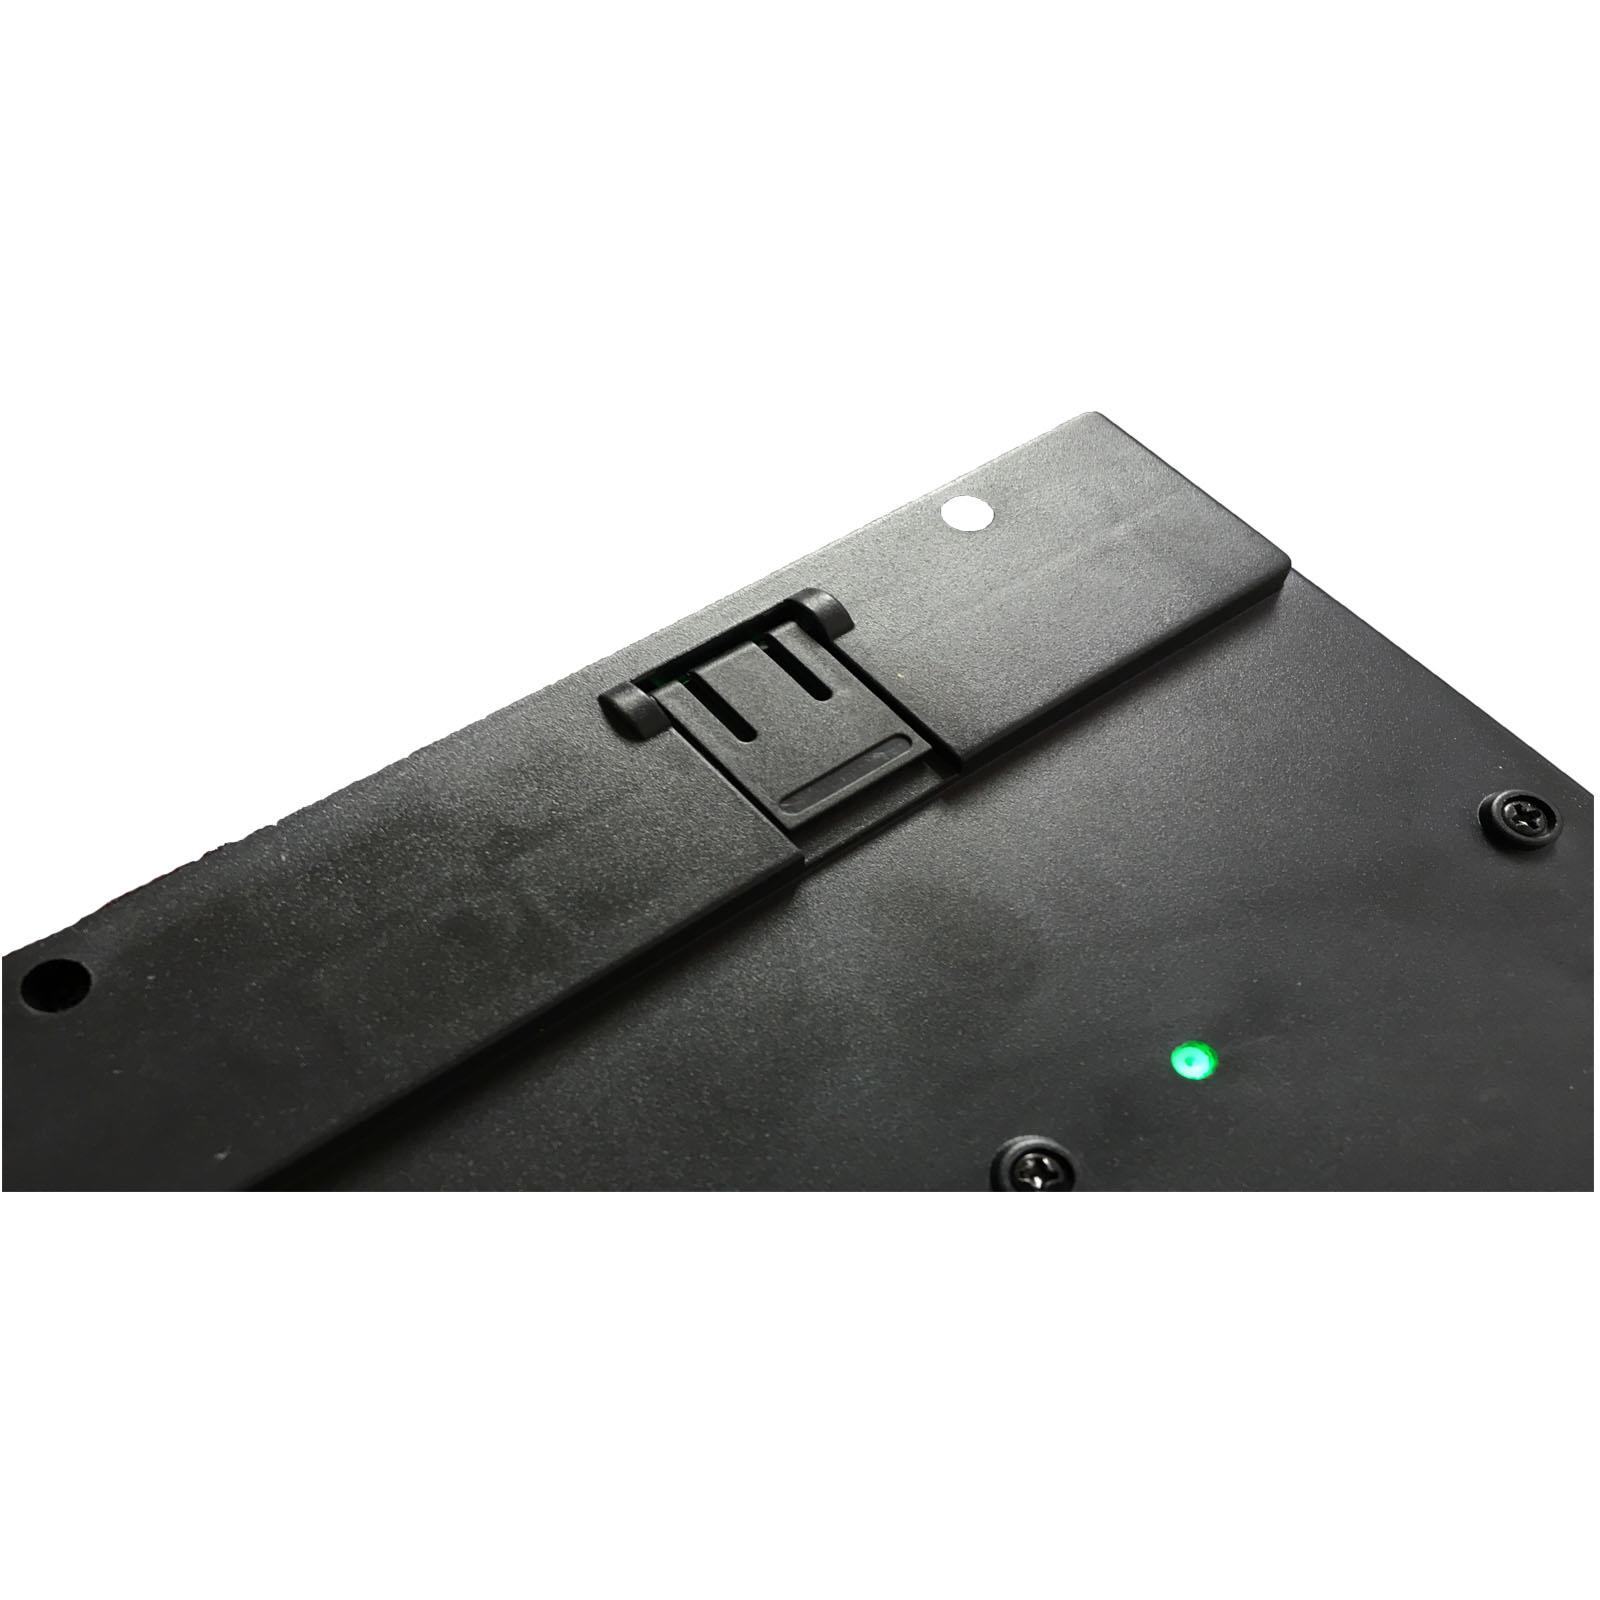 Gaming-Keyboard-Mouse-Backlit-Rainbow-LED-USB-Set-for-PC-Laptop-PS4-Xbox-One thumbnail 3